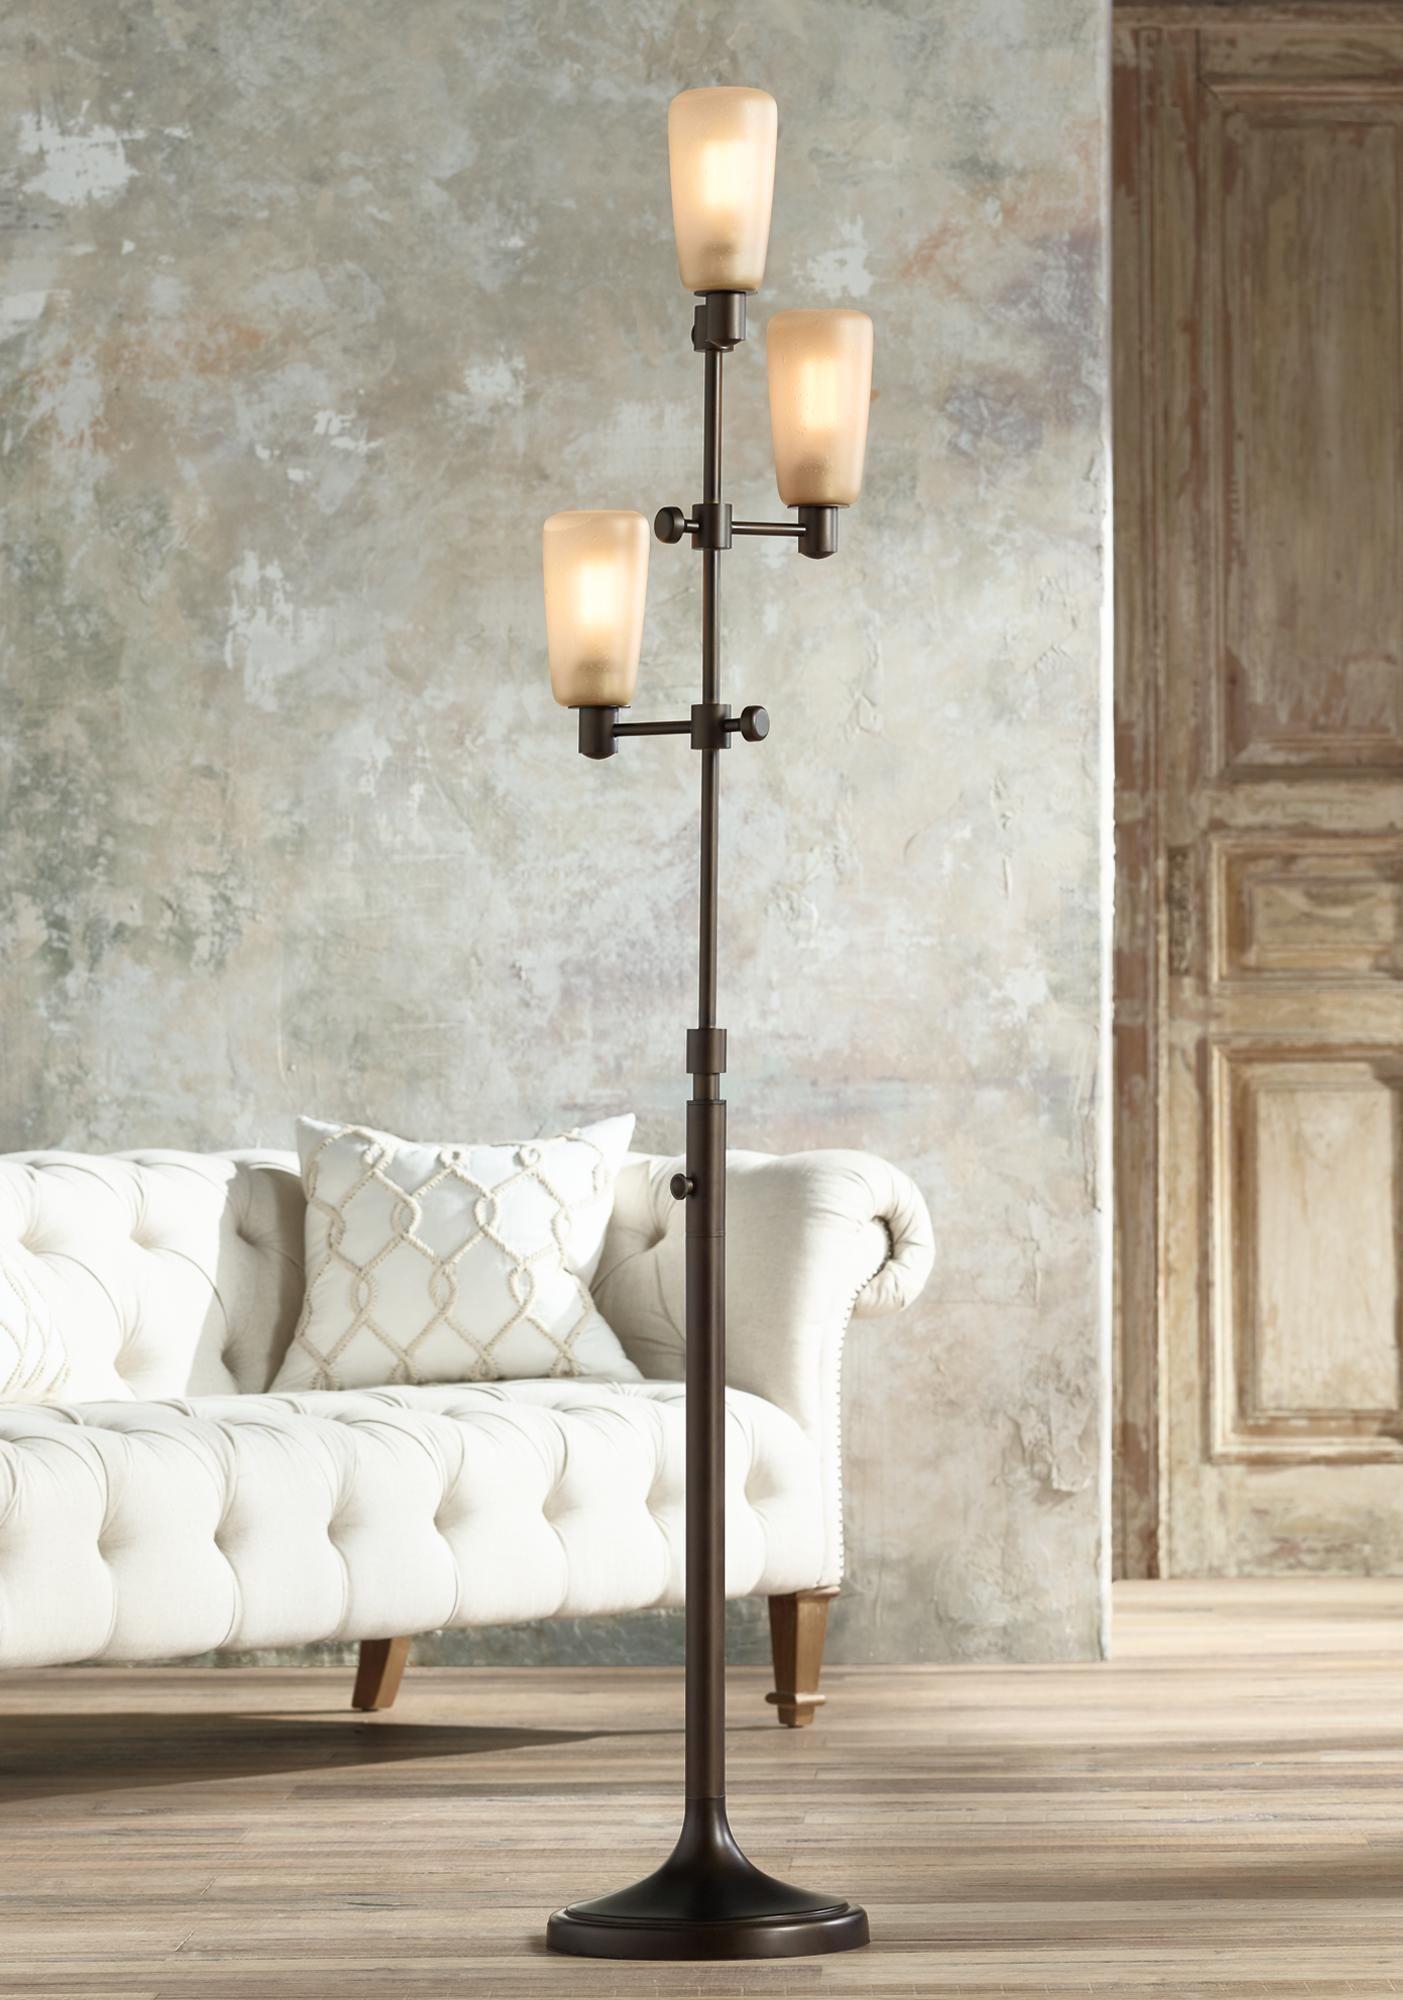 Ascot Oil Rubbed Bronze 3 Light Tree Floor Lamp 8j285 Lamps Plus Floor Lamp Lamps Living Room Tree Floor Lamp